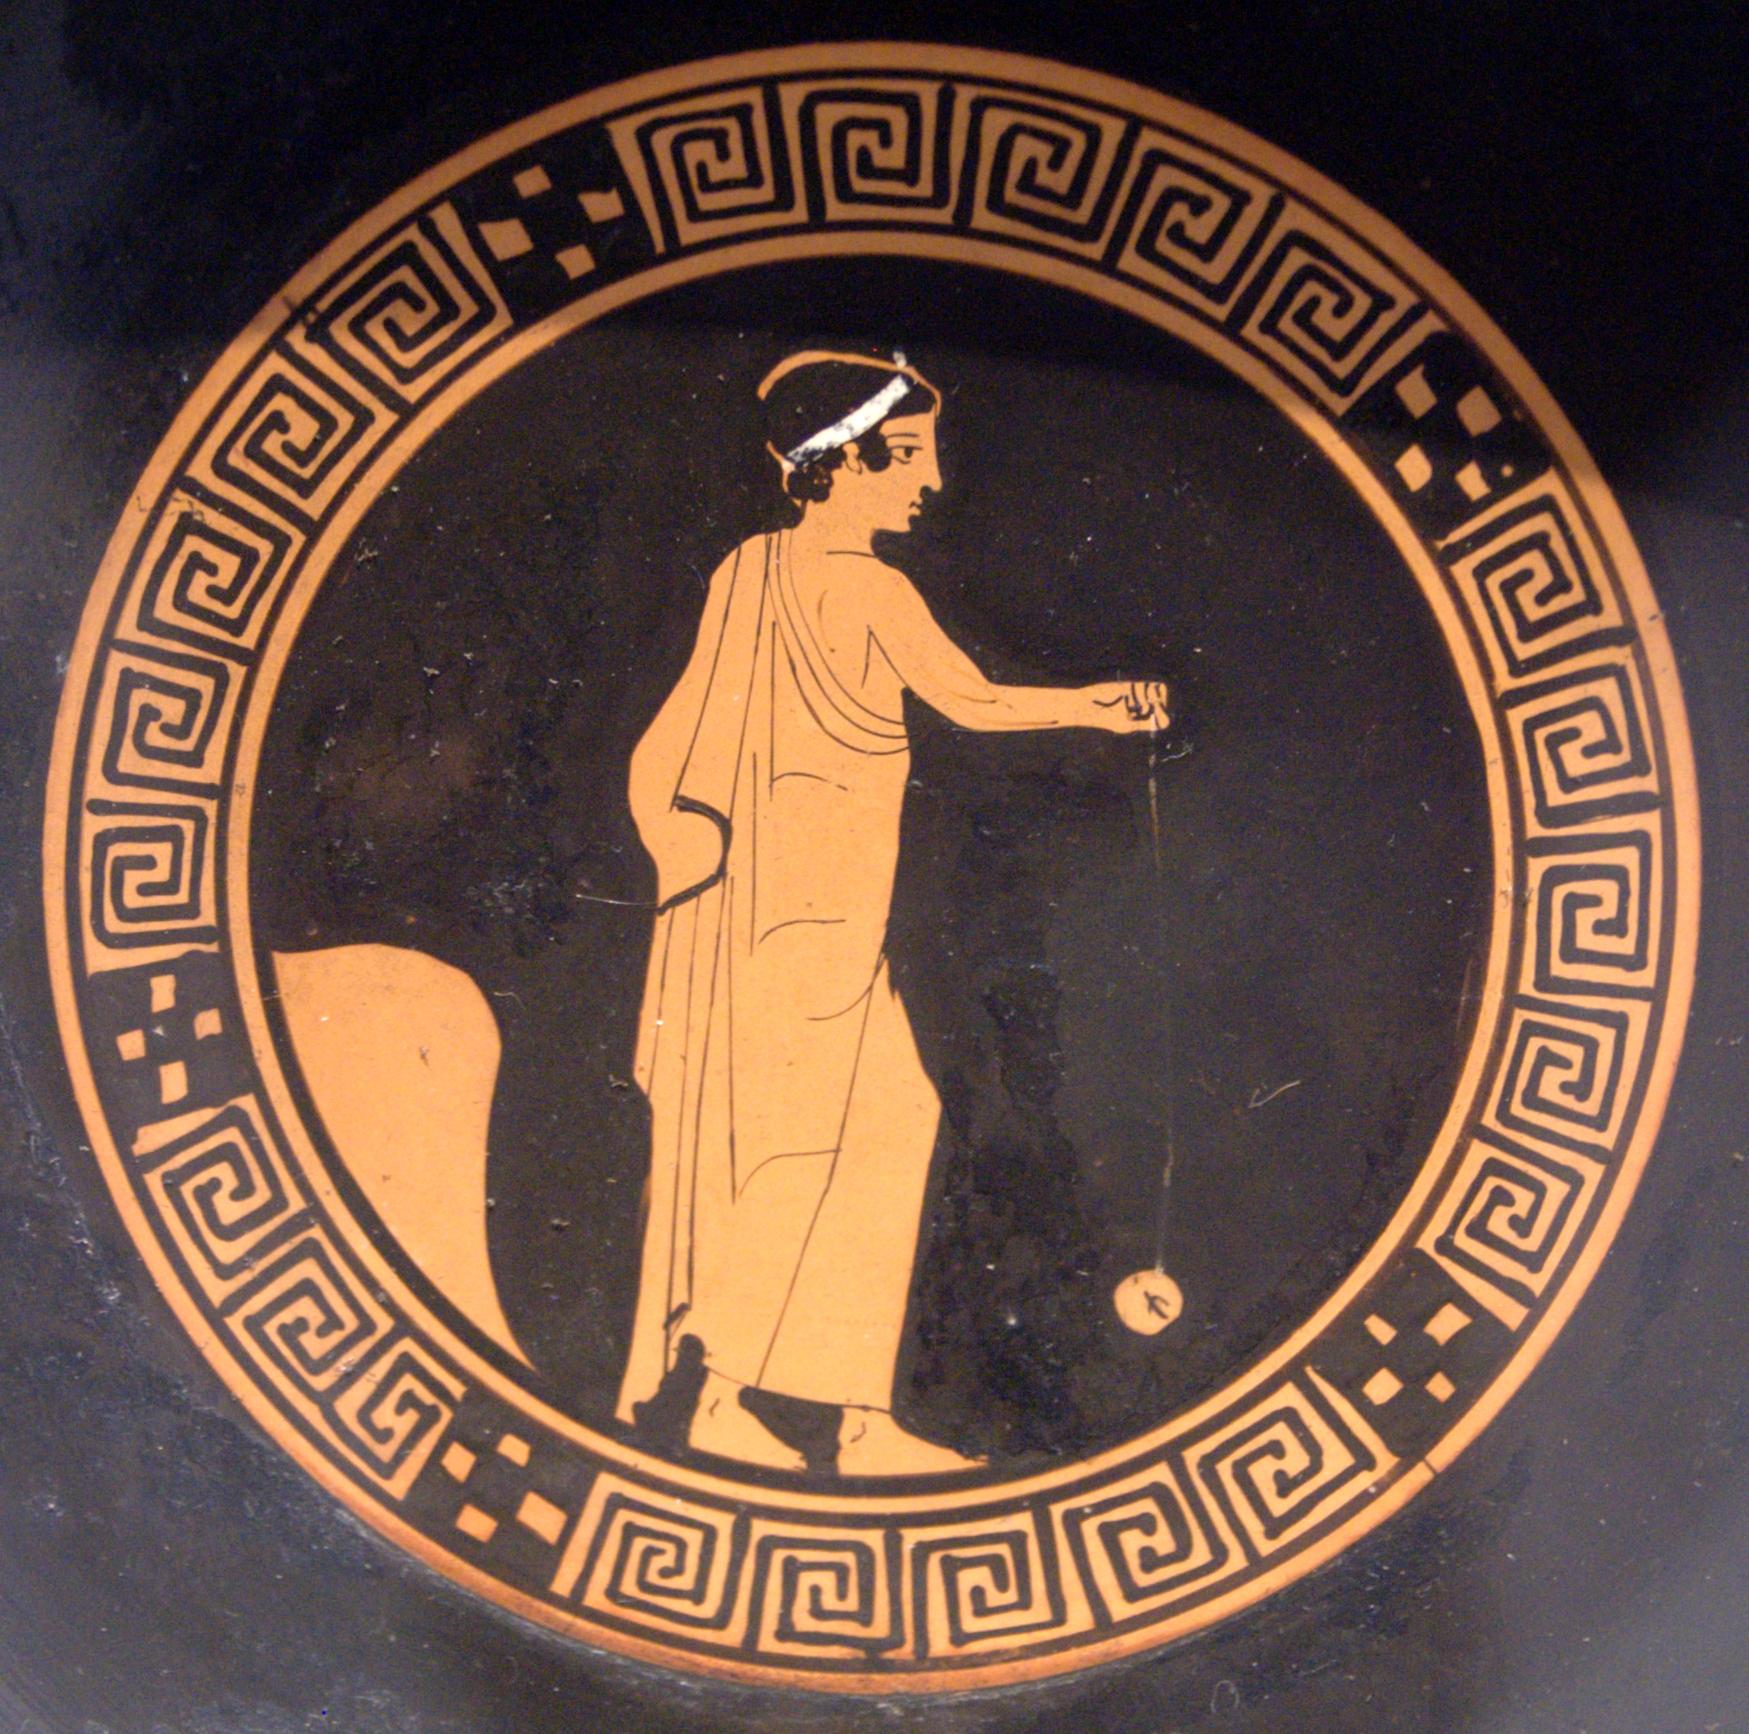 Fileyo yo player antikensammlung berlin f2549g wikimedia commons fileyo yo player antikensammlung berlin f2549g buycottarizona Images